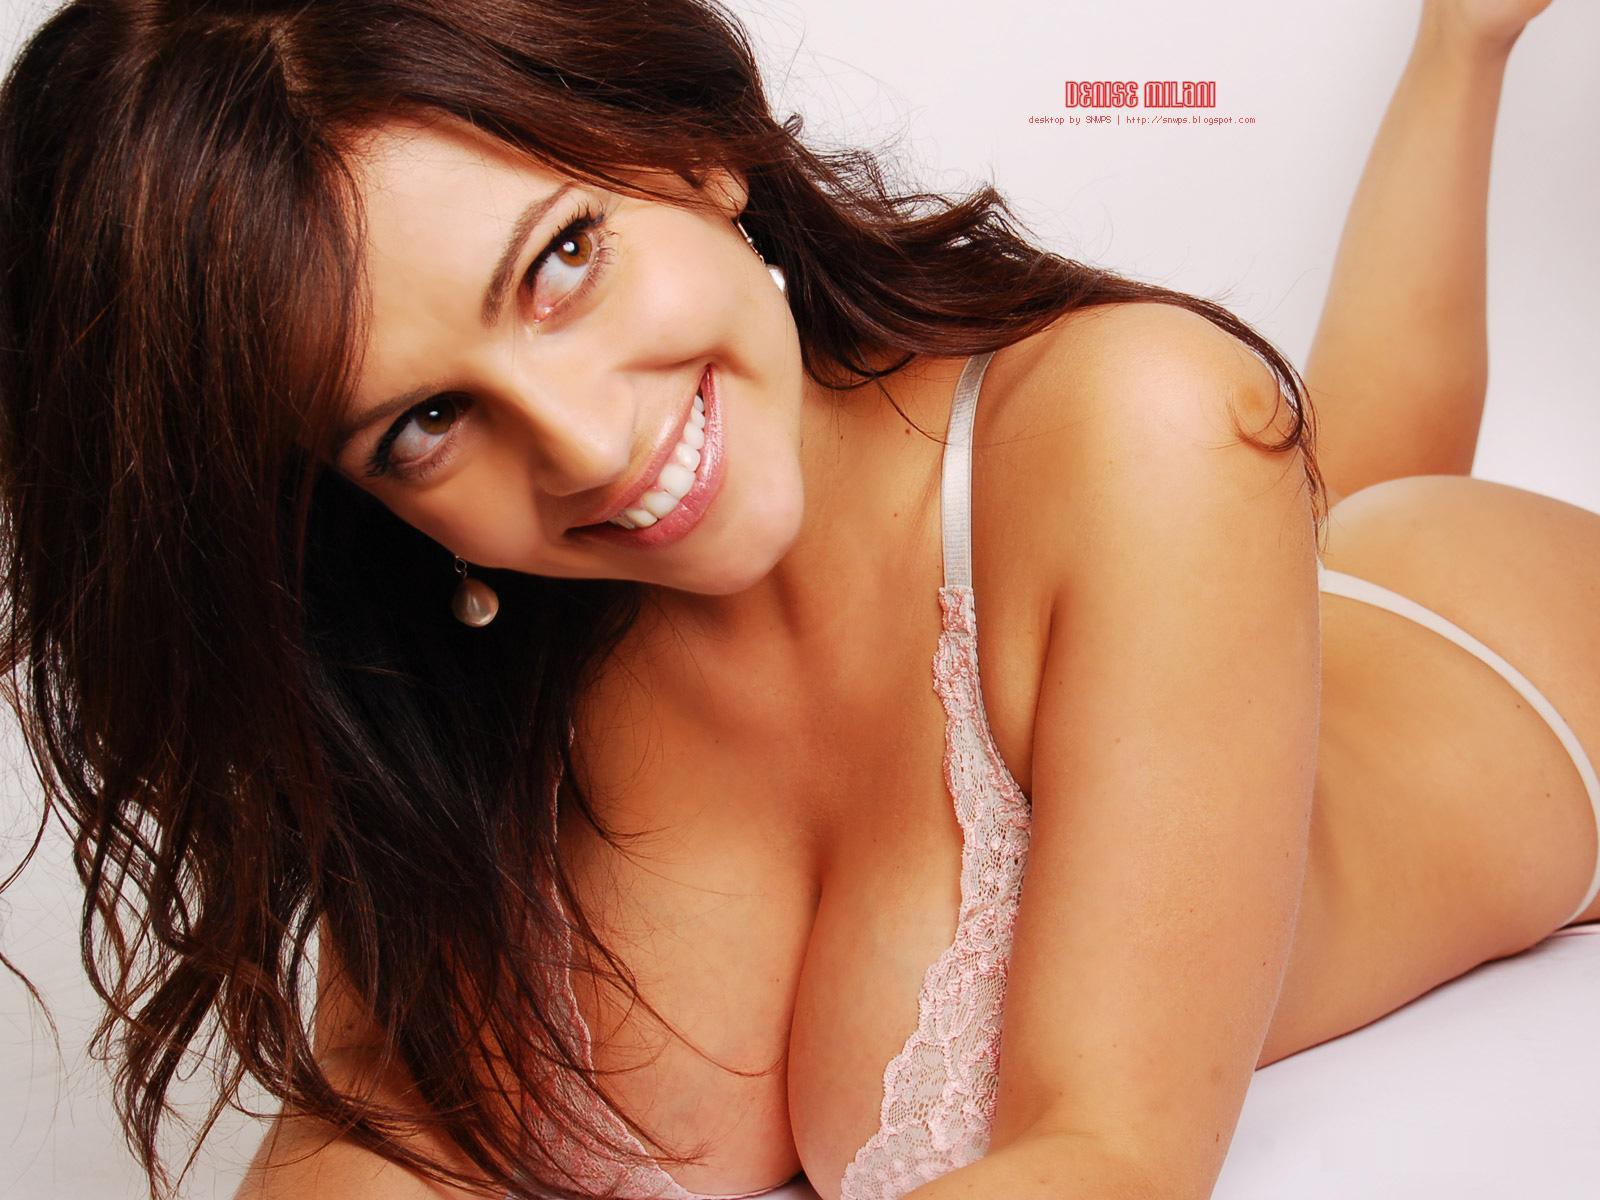 http://3.bp.blogspot.com/_Sxh0usZ8xvs/TG8KTDNVZkI/AAAAAAAAAls/eDtp-ZjnD9Y/s1600/Denise-Milani-1600x1200-213kb-media-2865-media-128734-1198120903.jpg